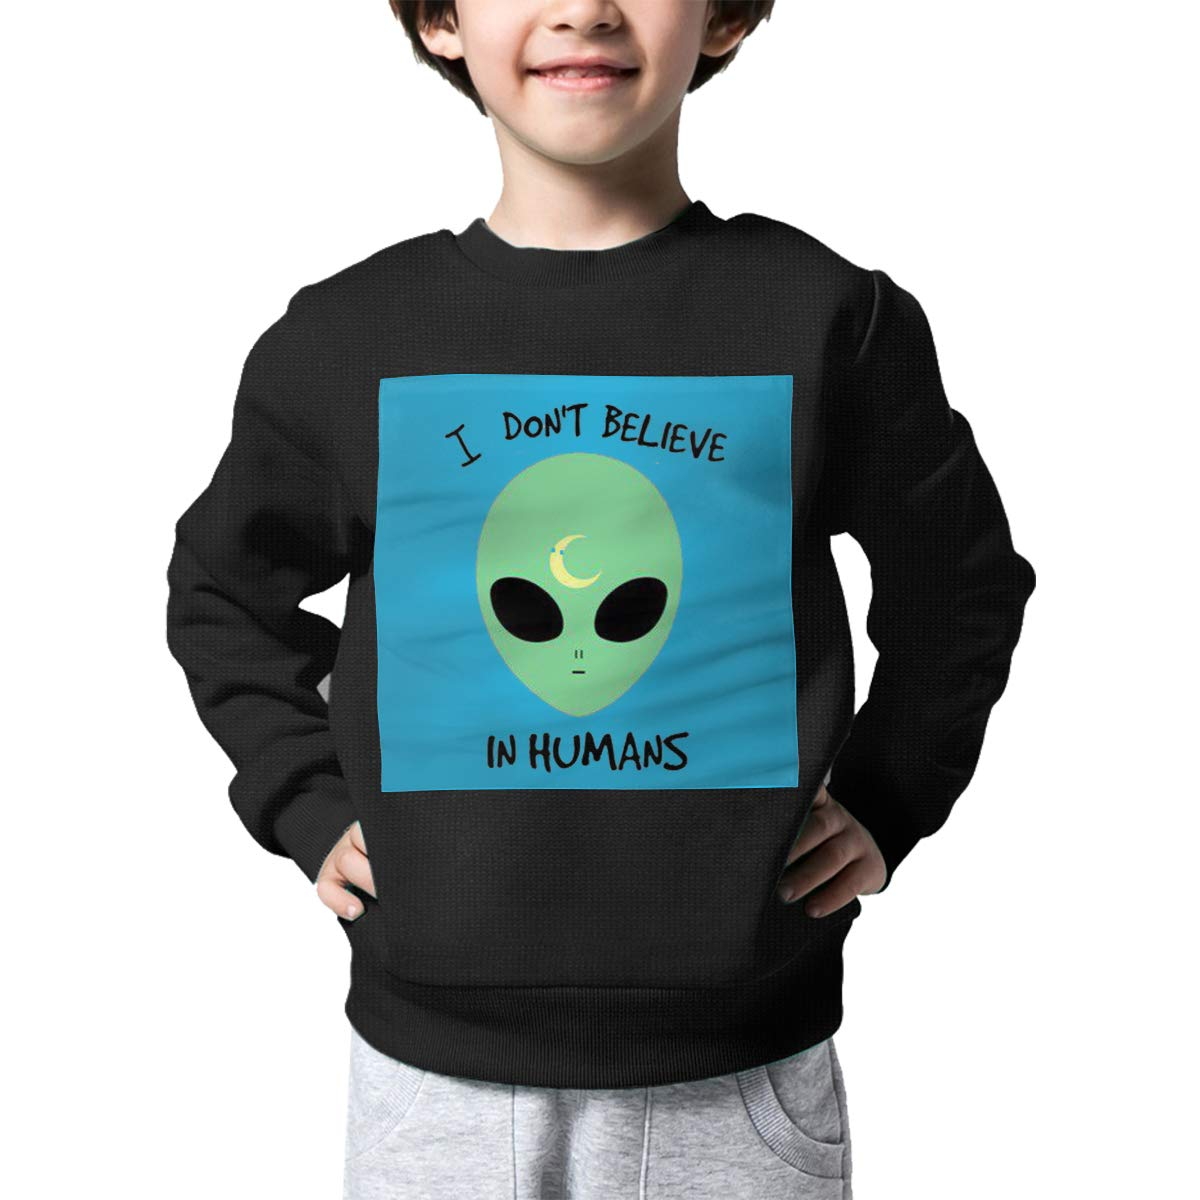 Rainbowhug UFO Alien Kids Sweater Cool Warm Sweater Toddler for Girls Boys